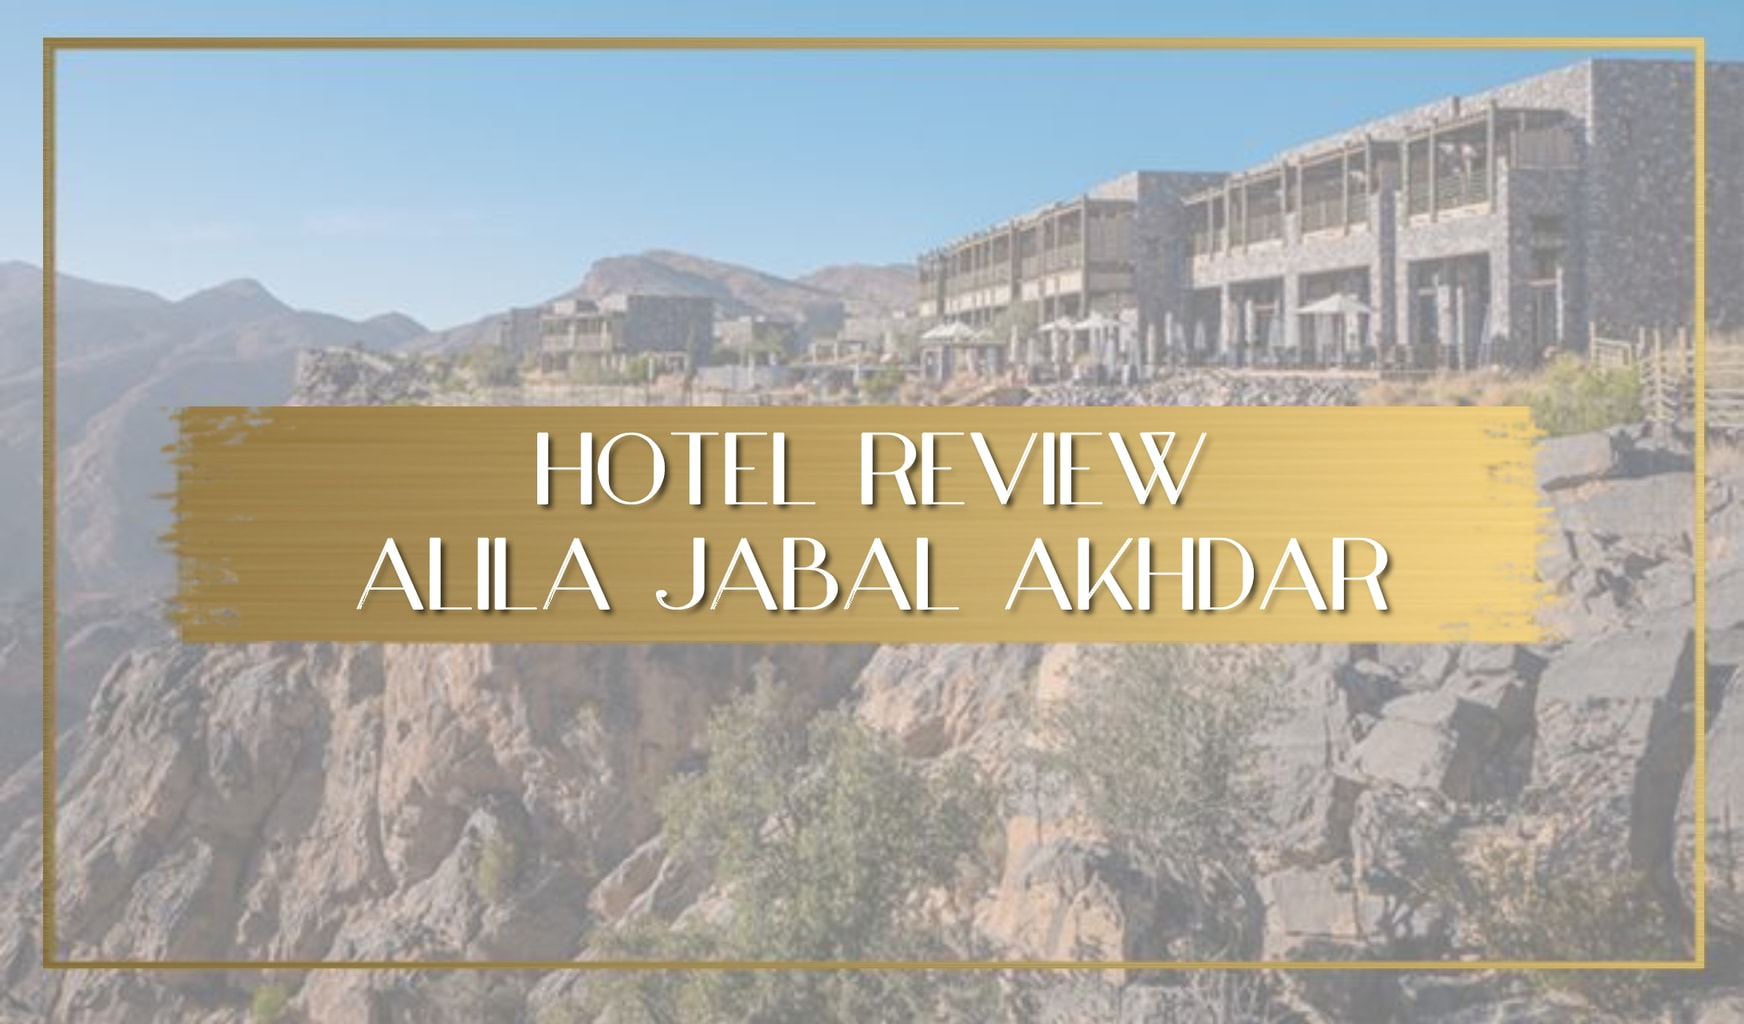 Review of Alila Jabal Akhbar Main